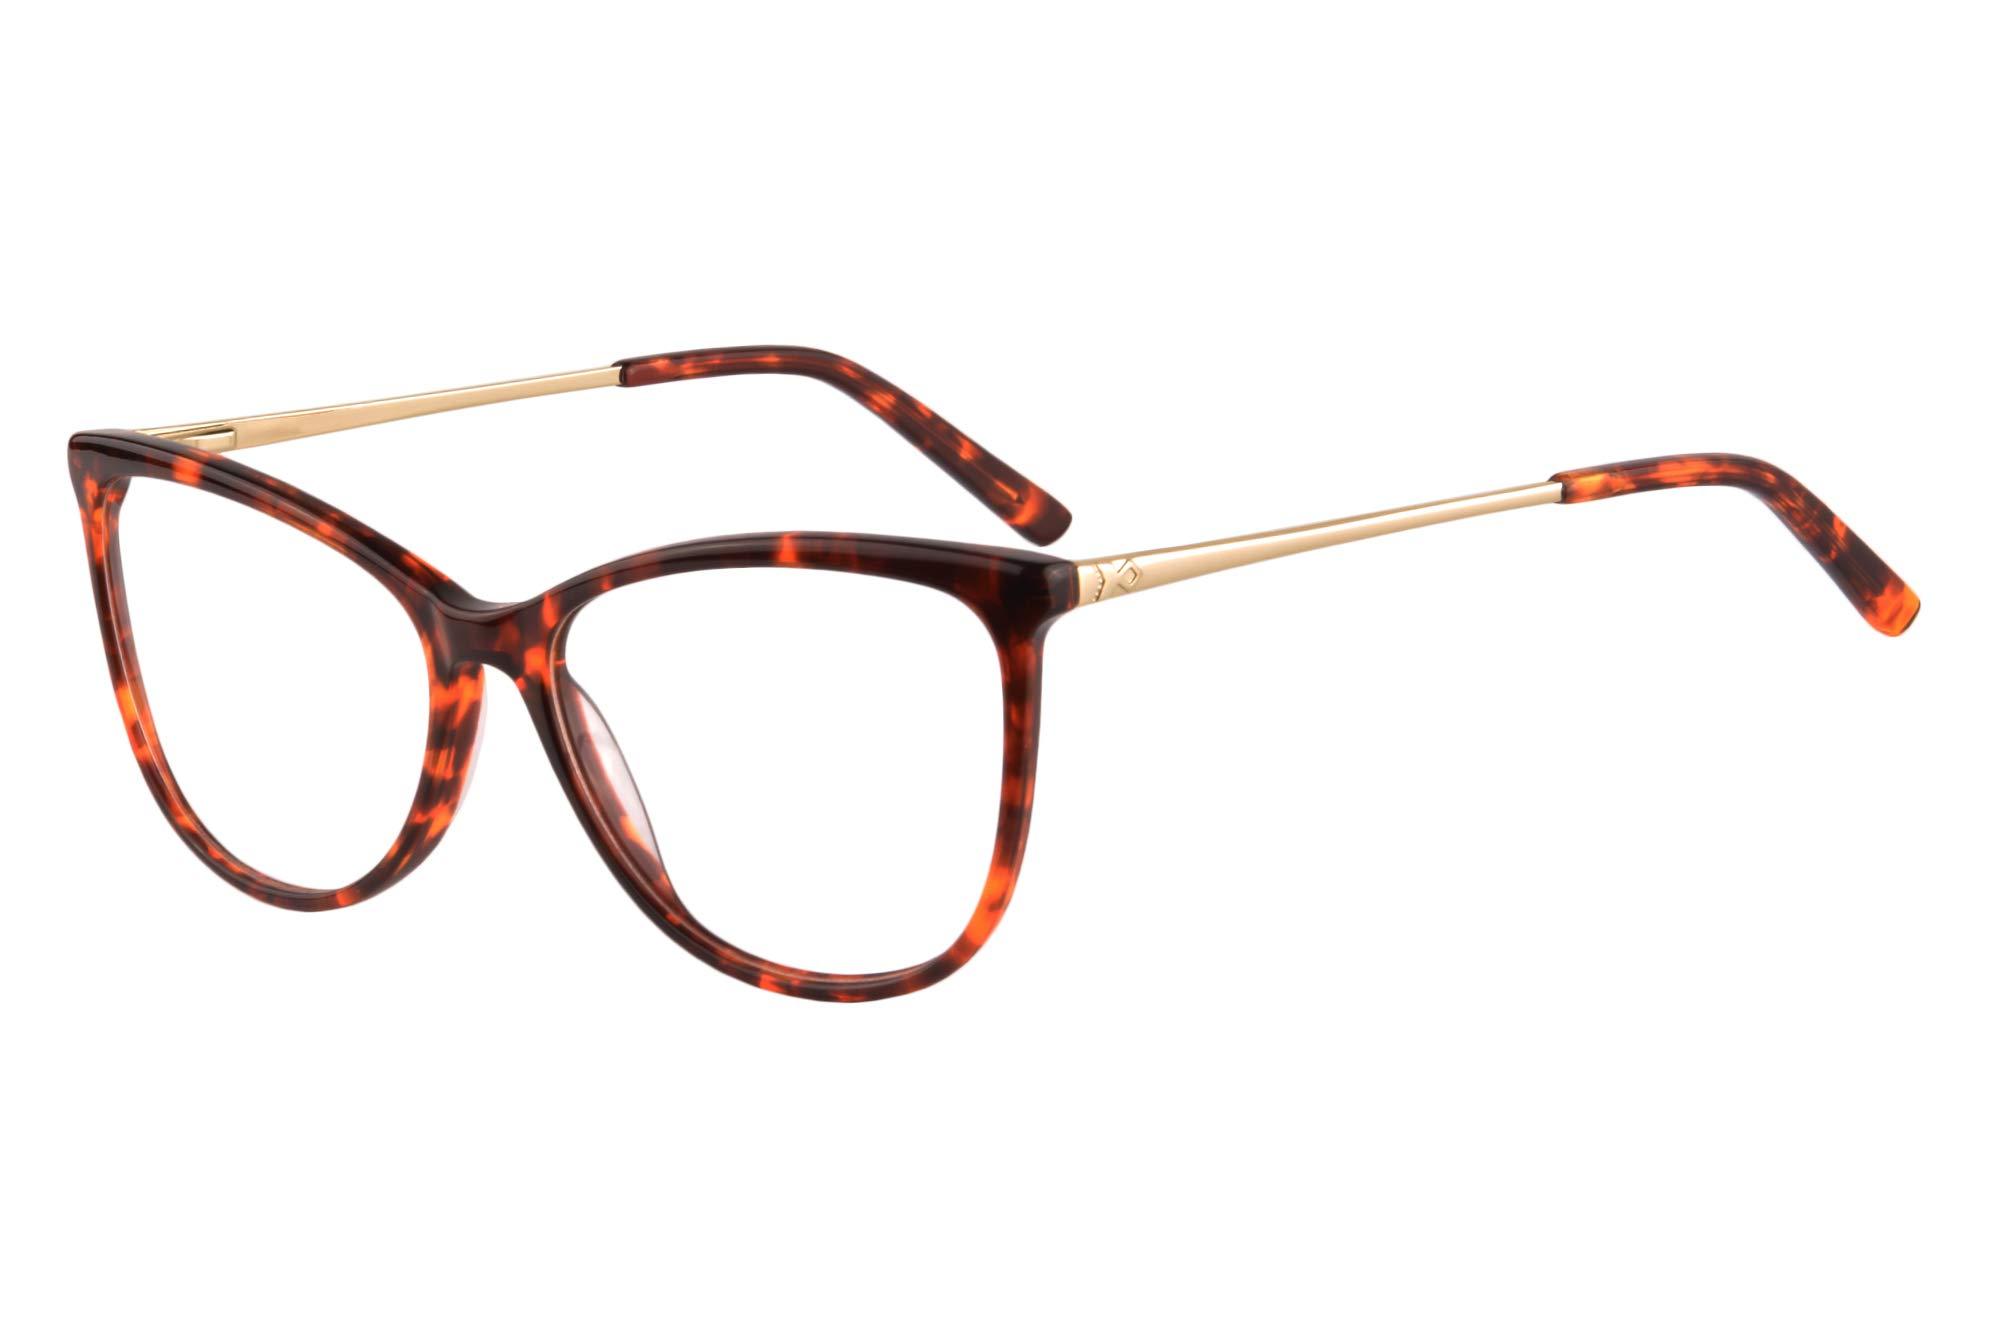 UOOUOO Acetate Cateye Anti-blue Light Computer Progressive Multifocus Reading Glasses-UOORD147